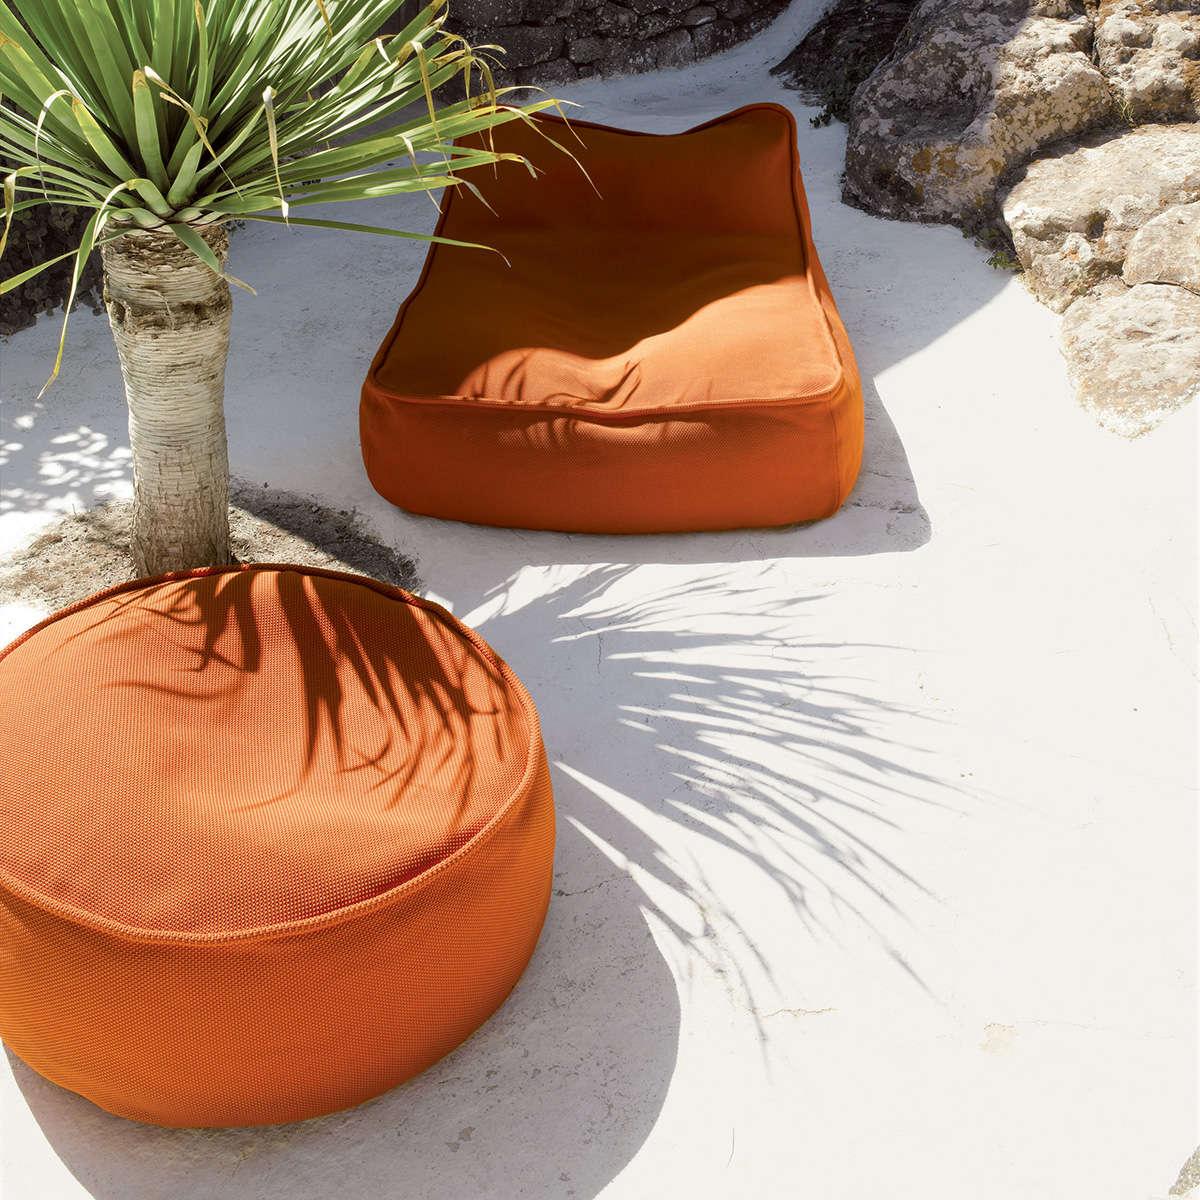 Float Paola Lenti Lounge Chair 2